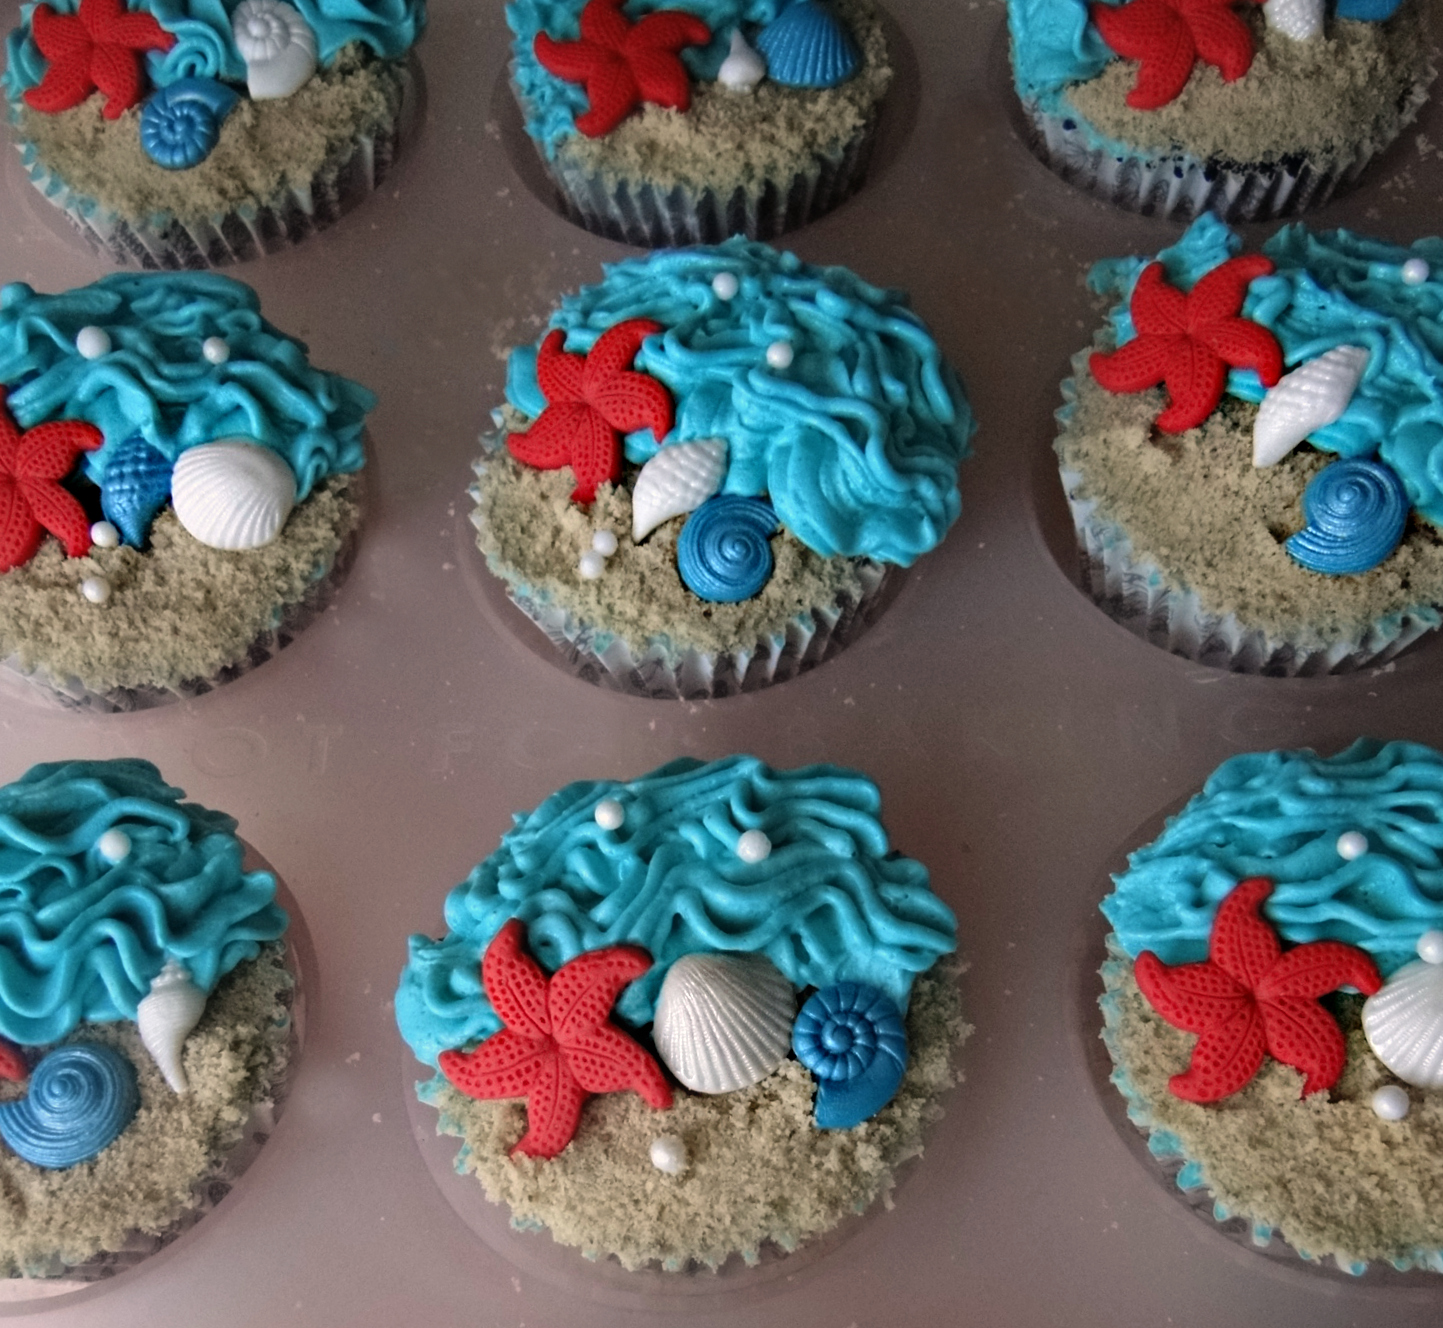 Wedding Cupcake Designed With Beach Theme